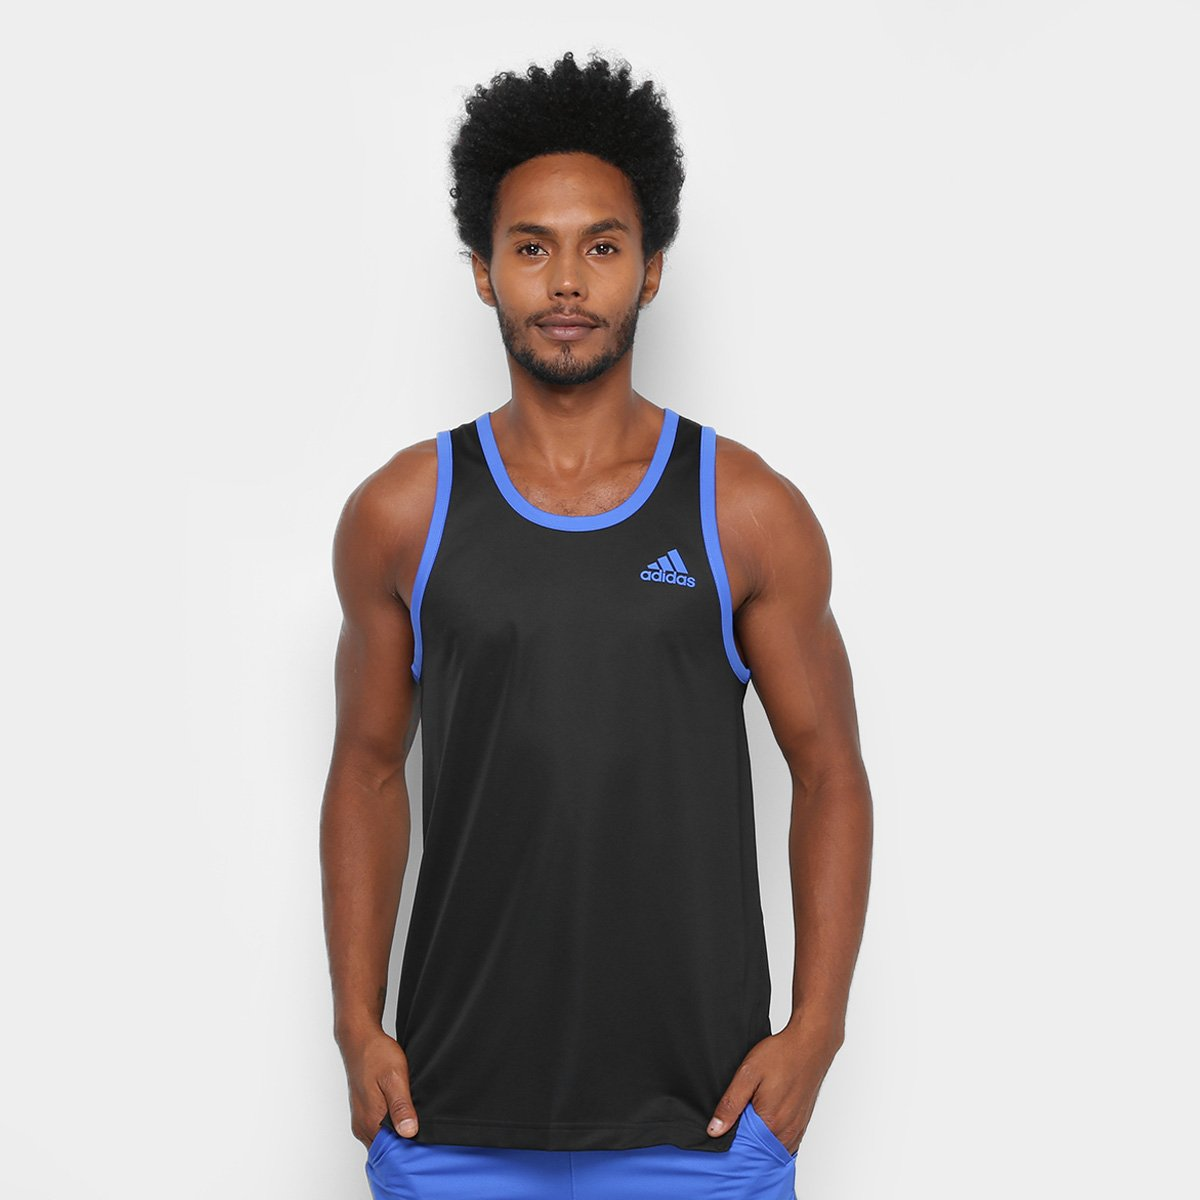 Regata Adidas Sport Masculina - Compre Agora  91ae757708c